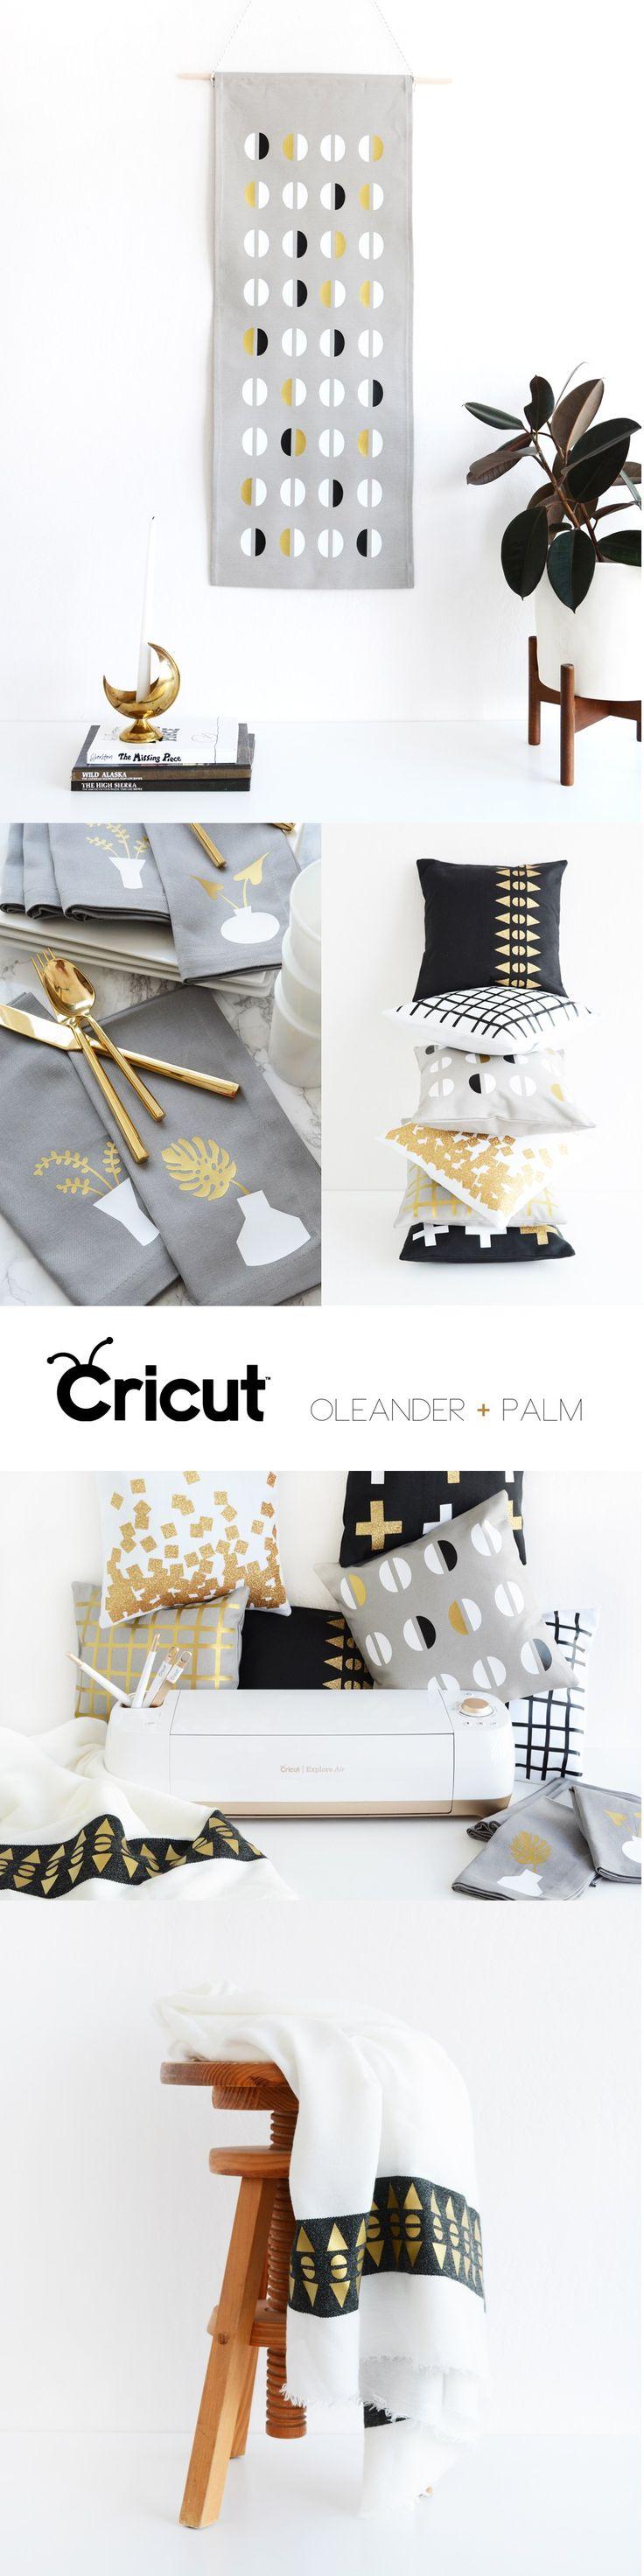 White apron joann fabrics - Cricut Gold Machine For Jo Ann Fabrics Oleander Palm Designs